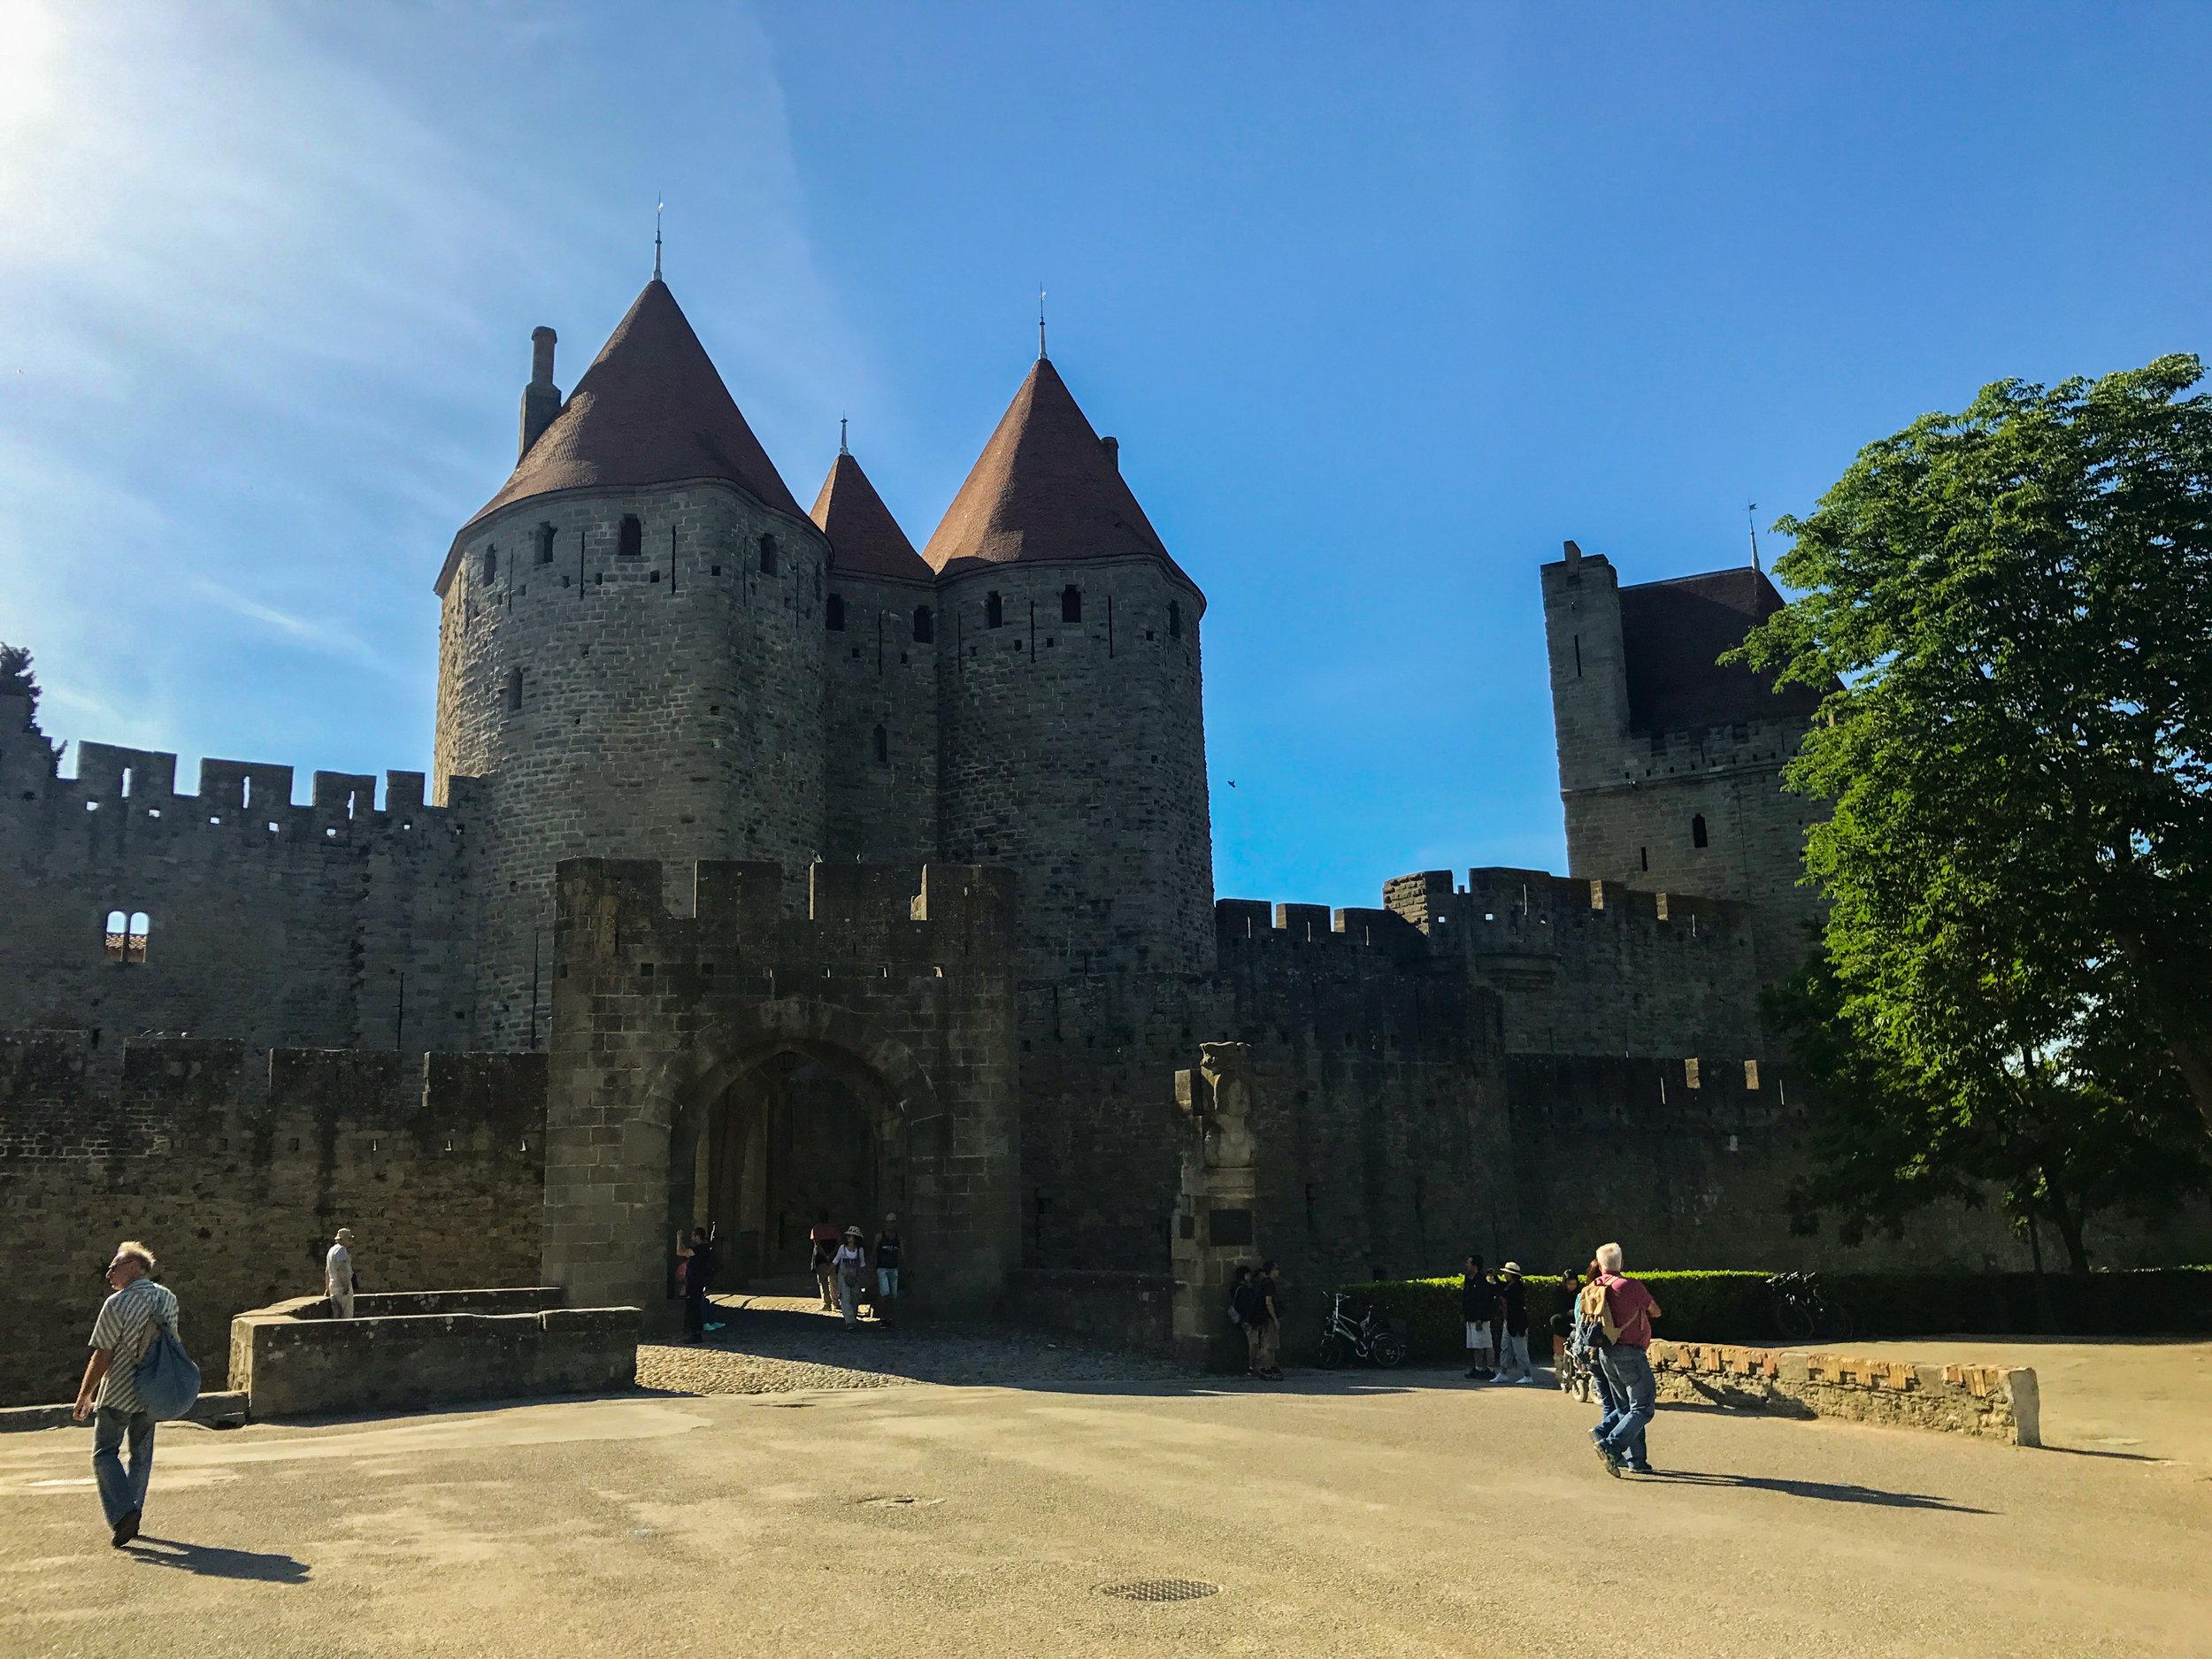 Drawbridge entrance to Carcassonne